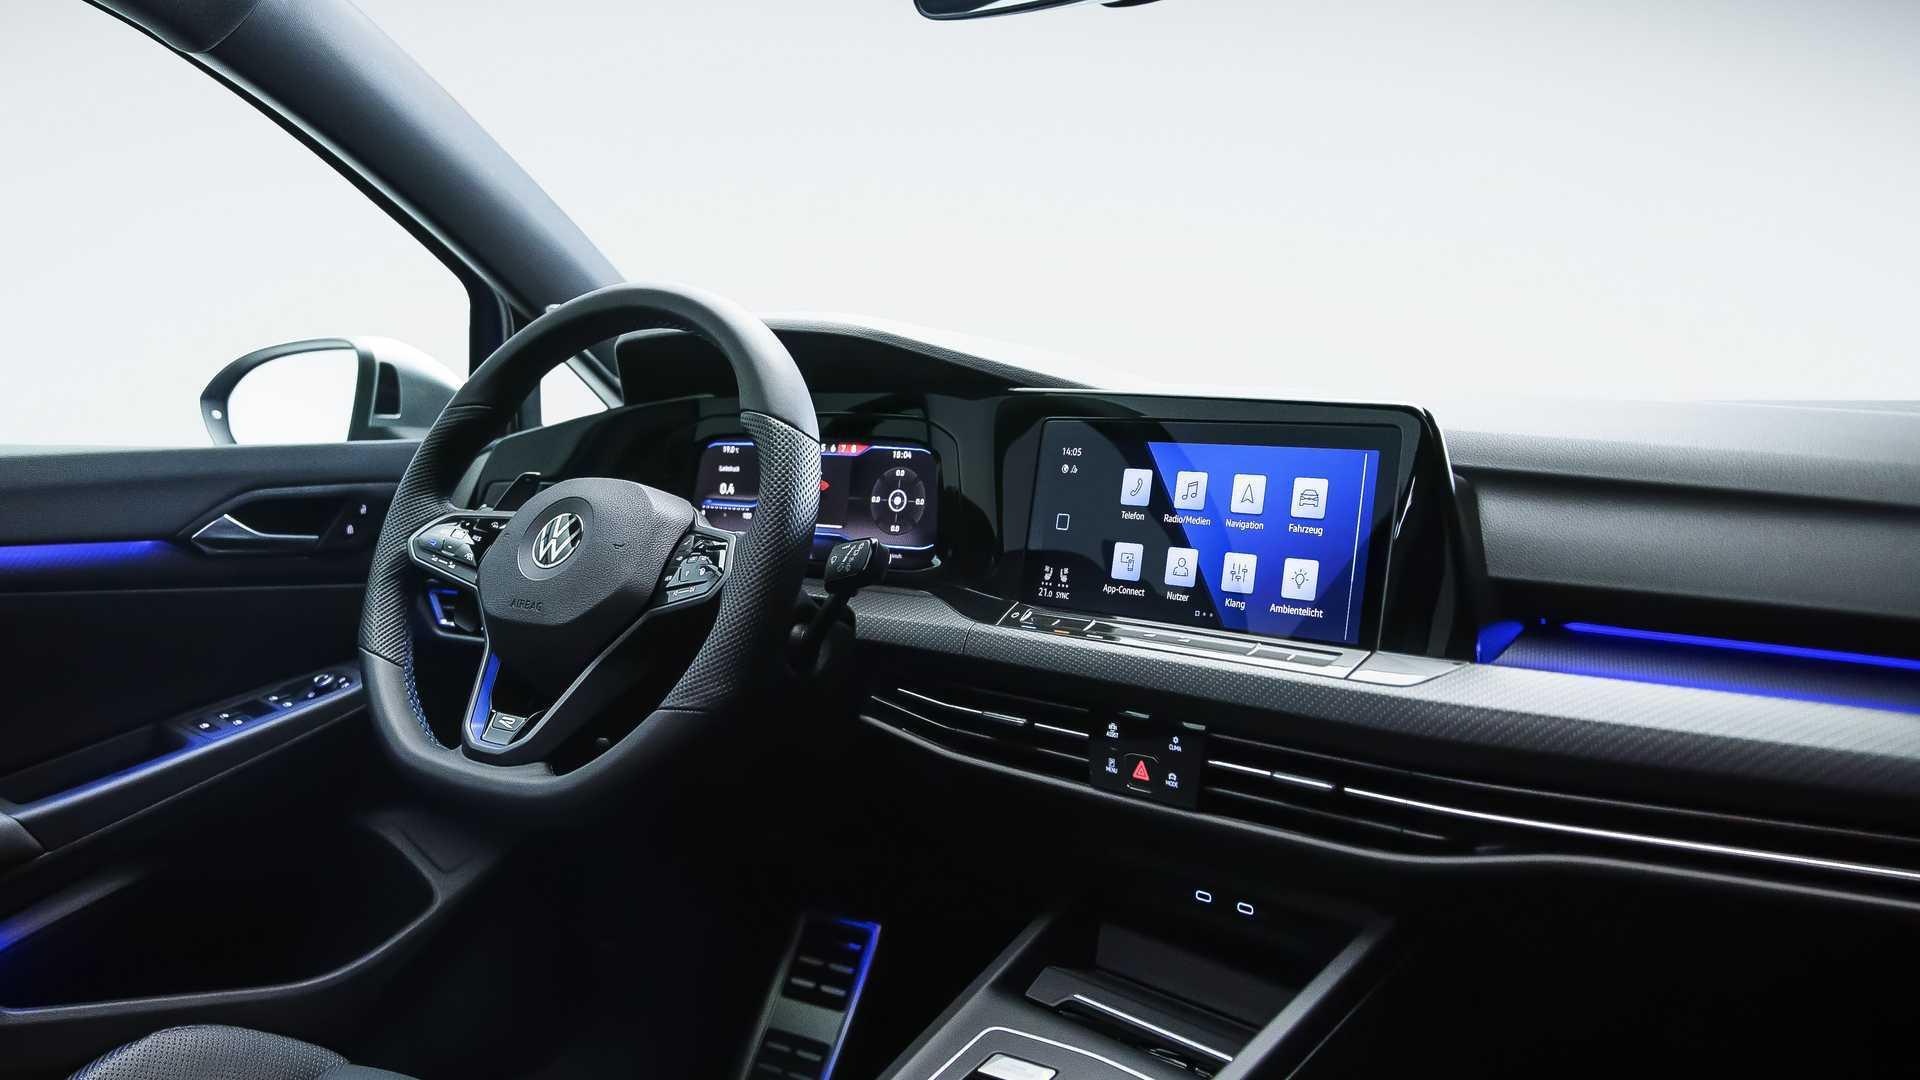 2022-volkswagen-golf-r-interior.jpg